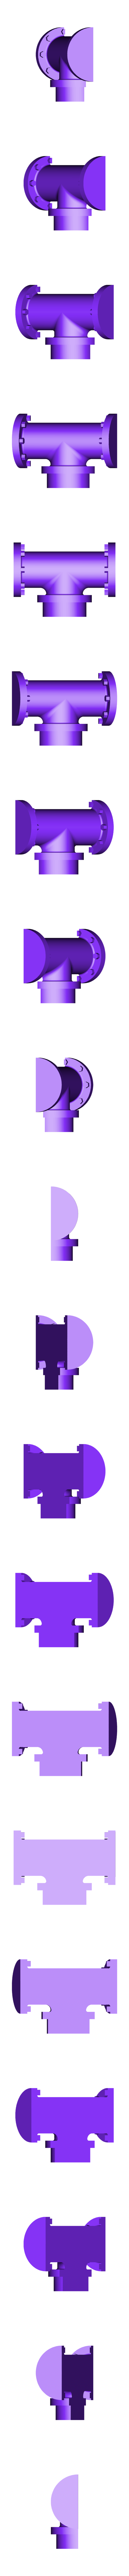 Pipe__T-b.STL Download free STL file 4-8-8-4 Big Boy Locomotive • 3D printer object, RaymondDeLuca